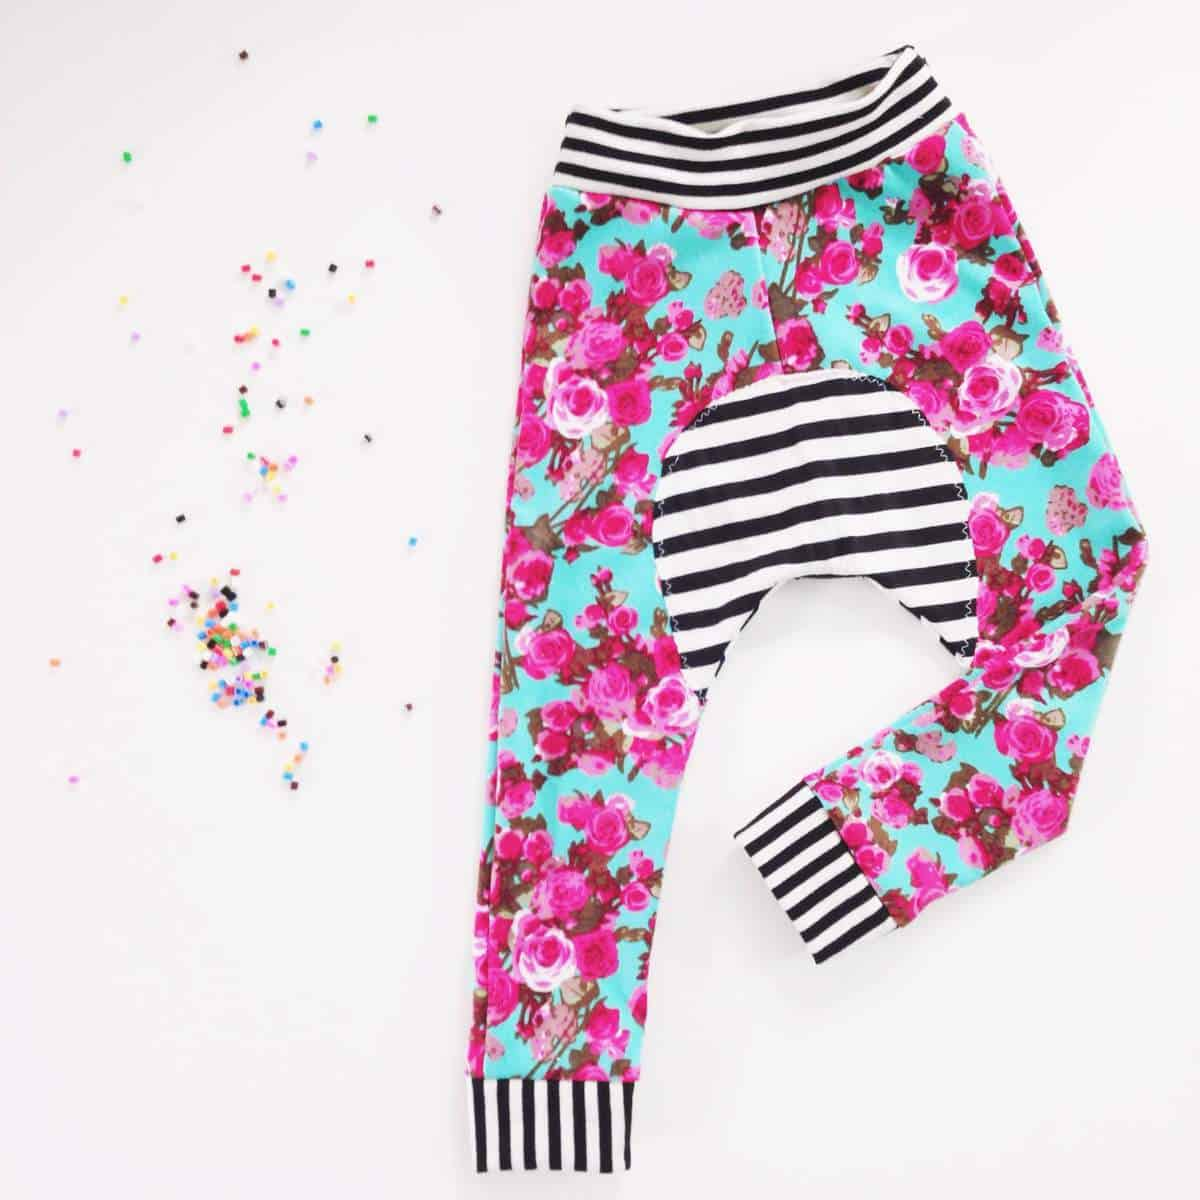 Knit Shorts Pattern : NEW PATTERN! The ARLO shorties + knit pants! see kate sew Bloglovin